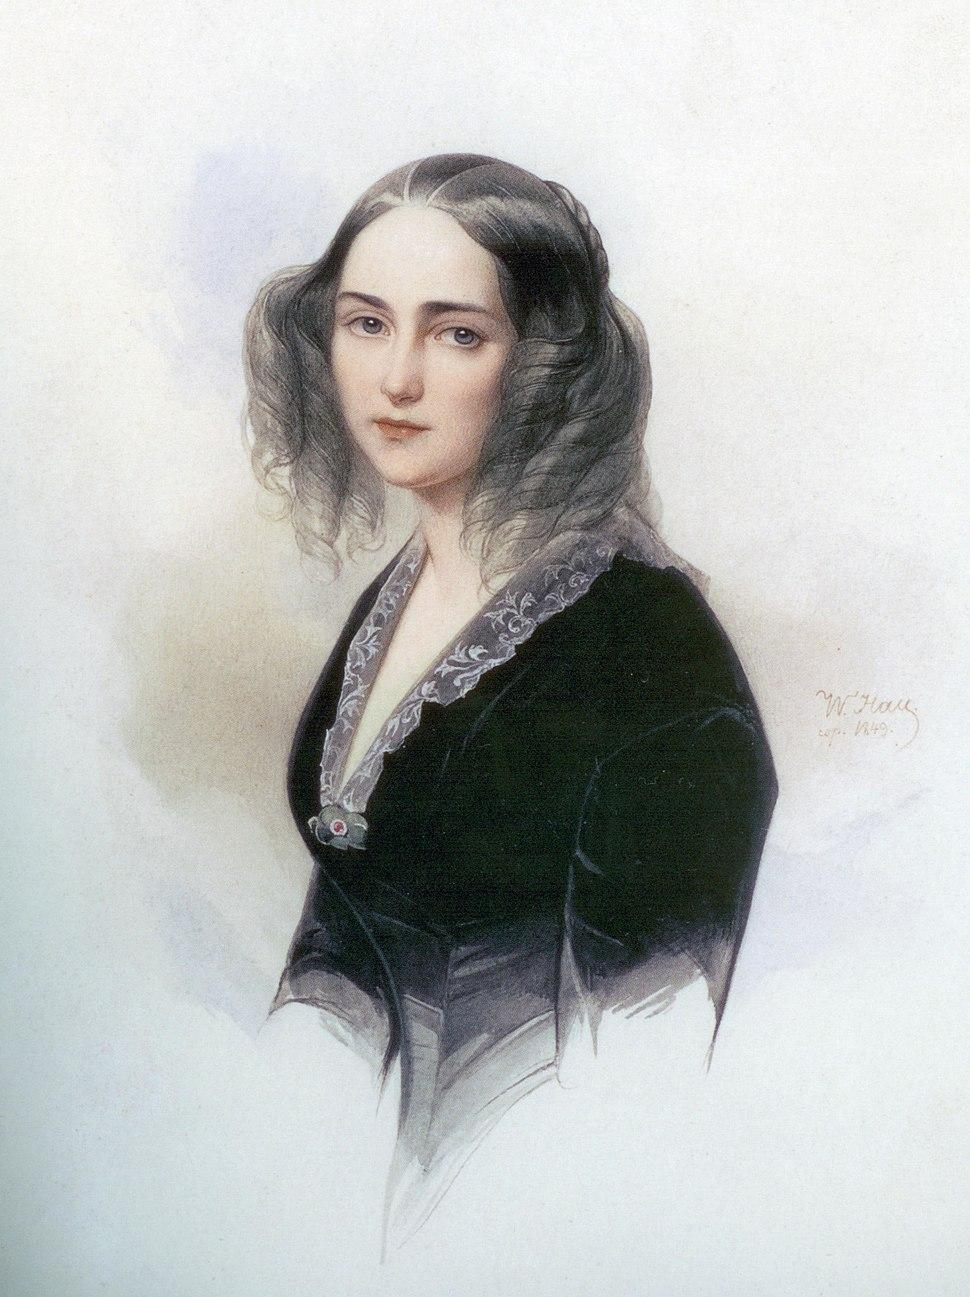 E.Musina-Pushkina by V.Gau (1840, GRM)